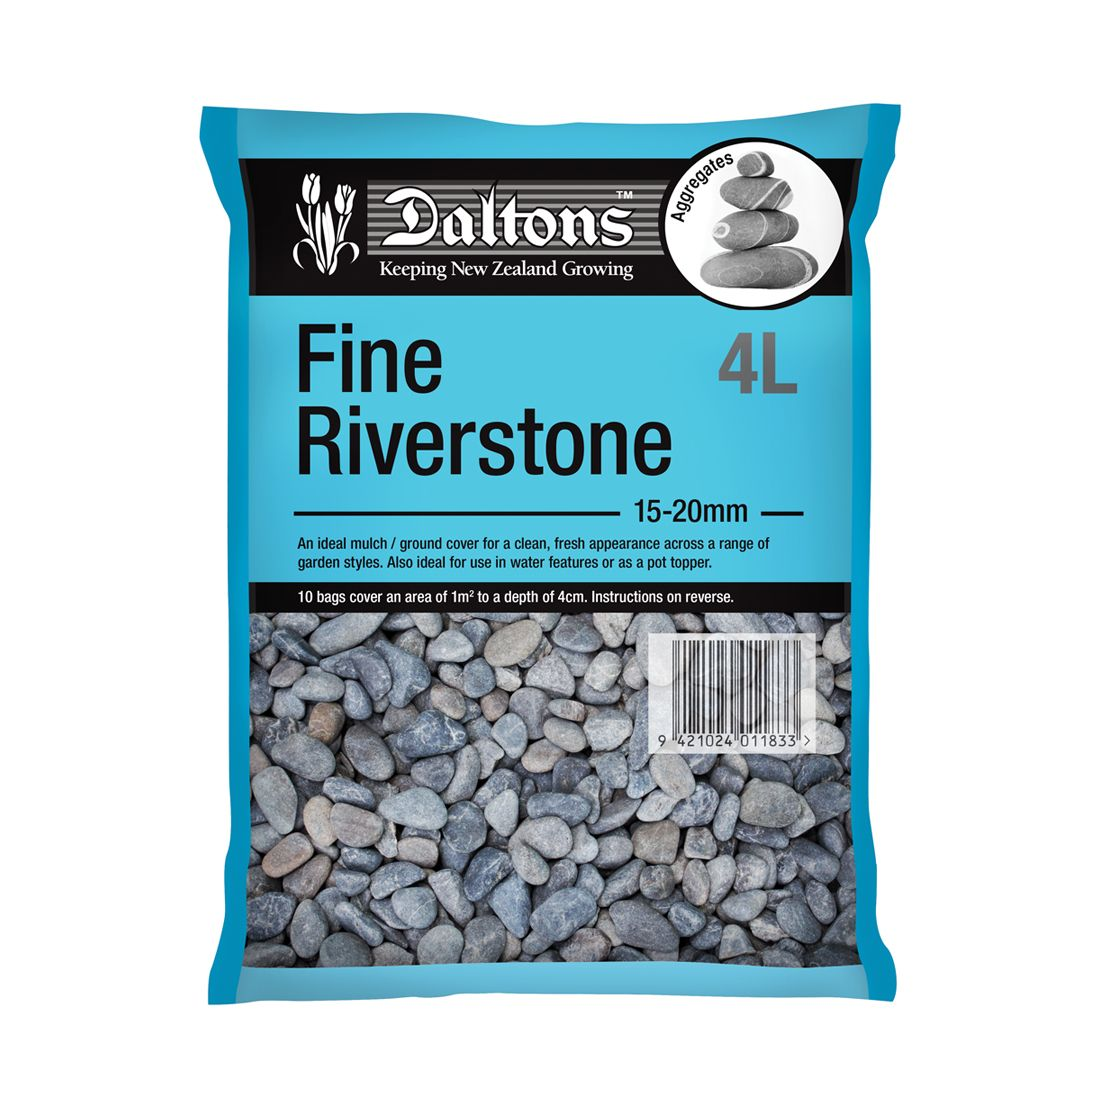 Fine Riverstone 4L Bag